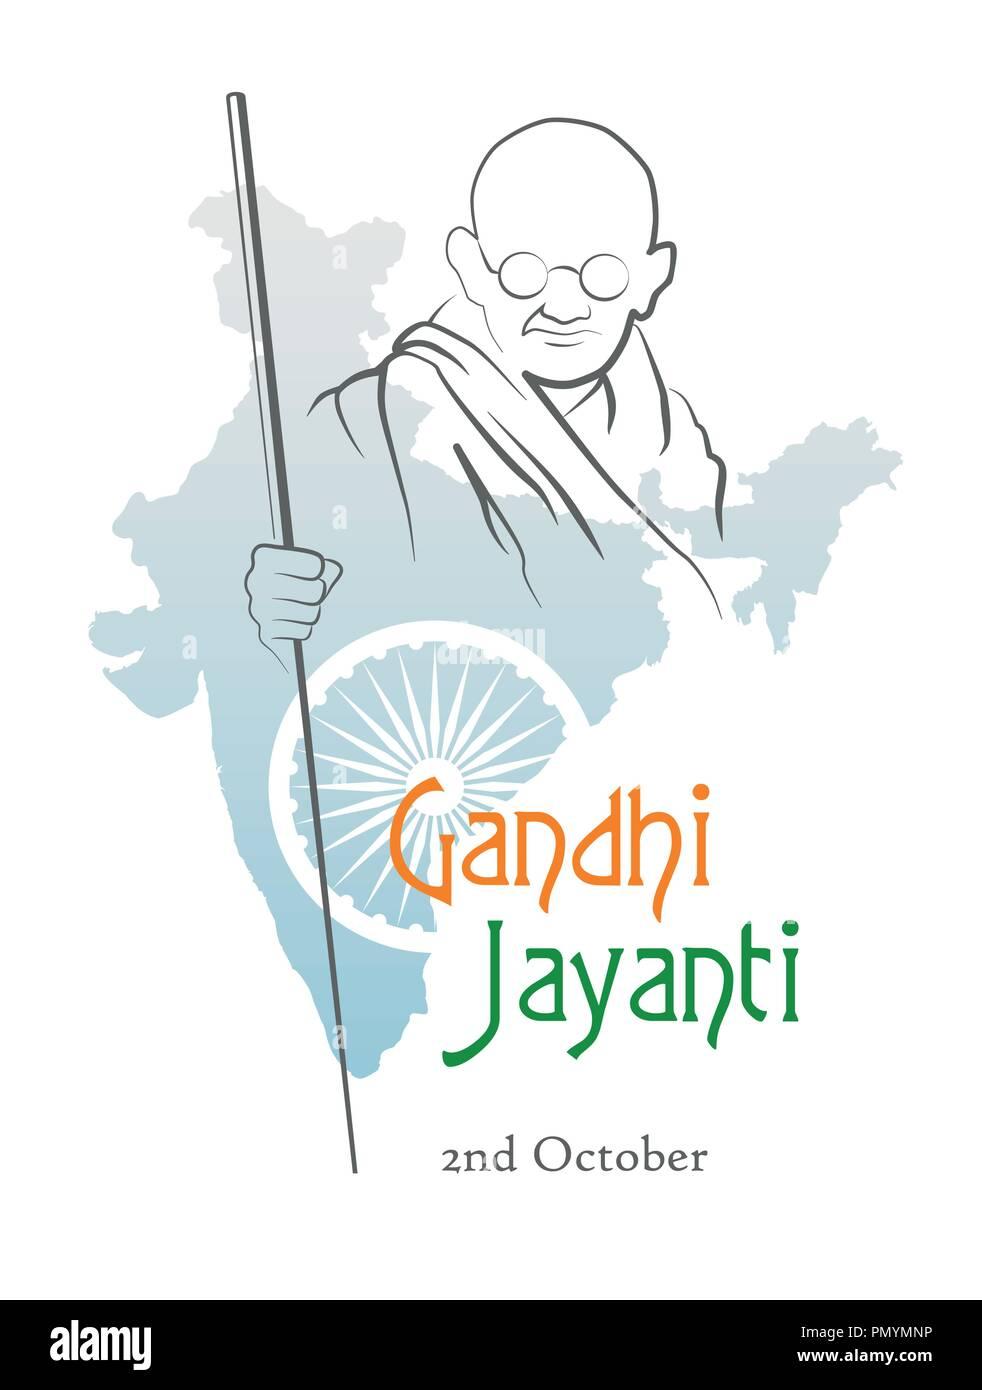 Le 2 octobre. Gandhi Jayanti. L'Inde. Croquis abstraits de Mahatma Gandhi avec le chakra d'Ashoka sur la silhouette de la carte de l'Inde. Vector illustration. Photo Stock